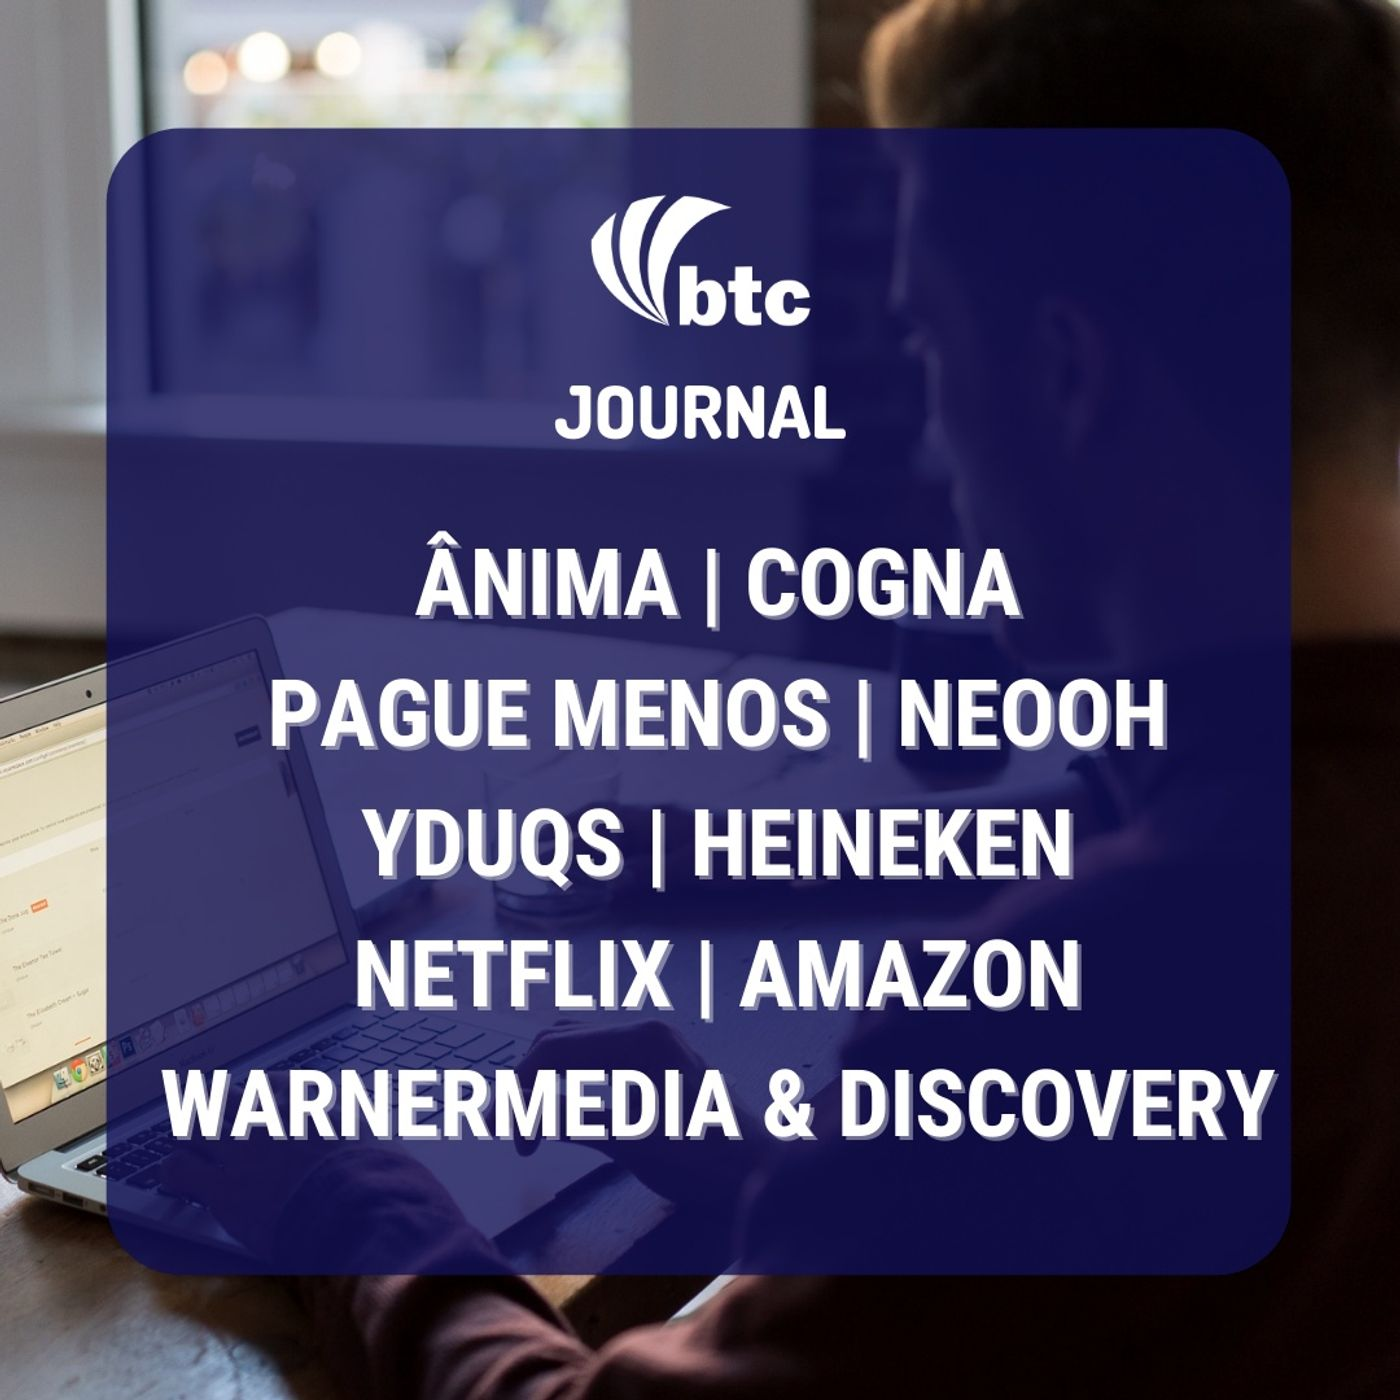 Anima, Cogna, Yduqs   Netflix, Amazon   Pague Menos, Neooh e Home Office   Journal 20/05/21